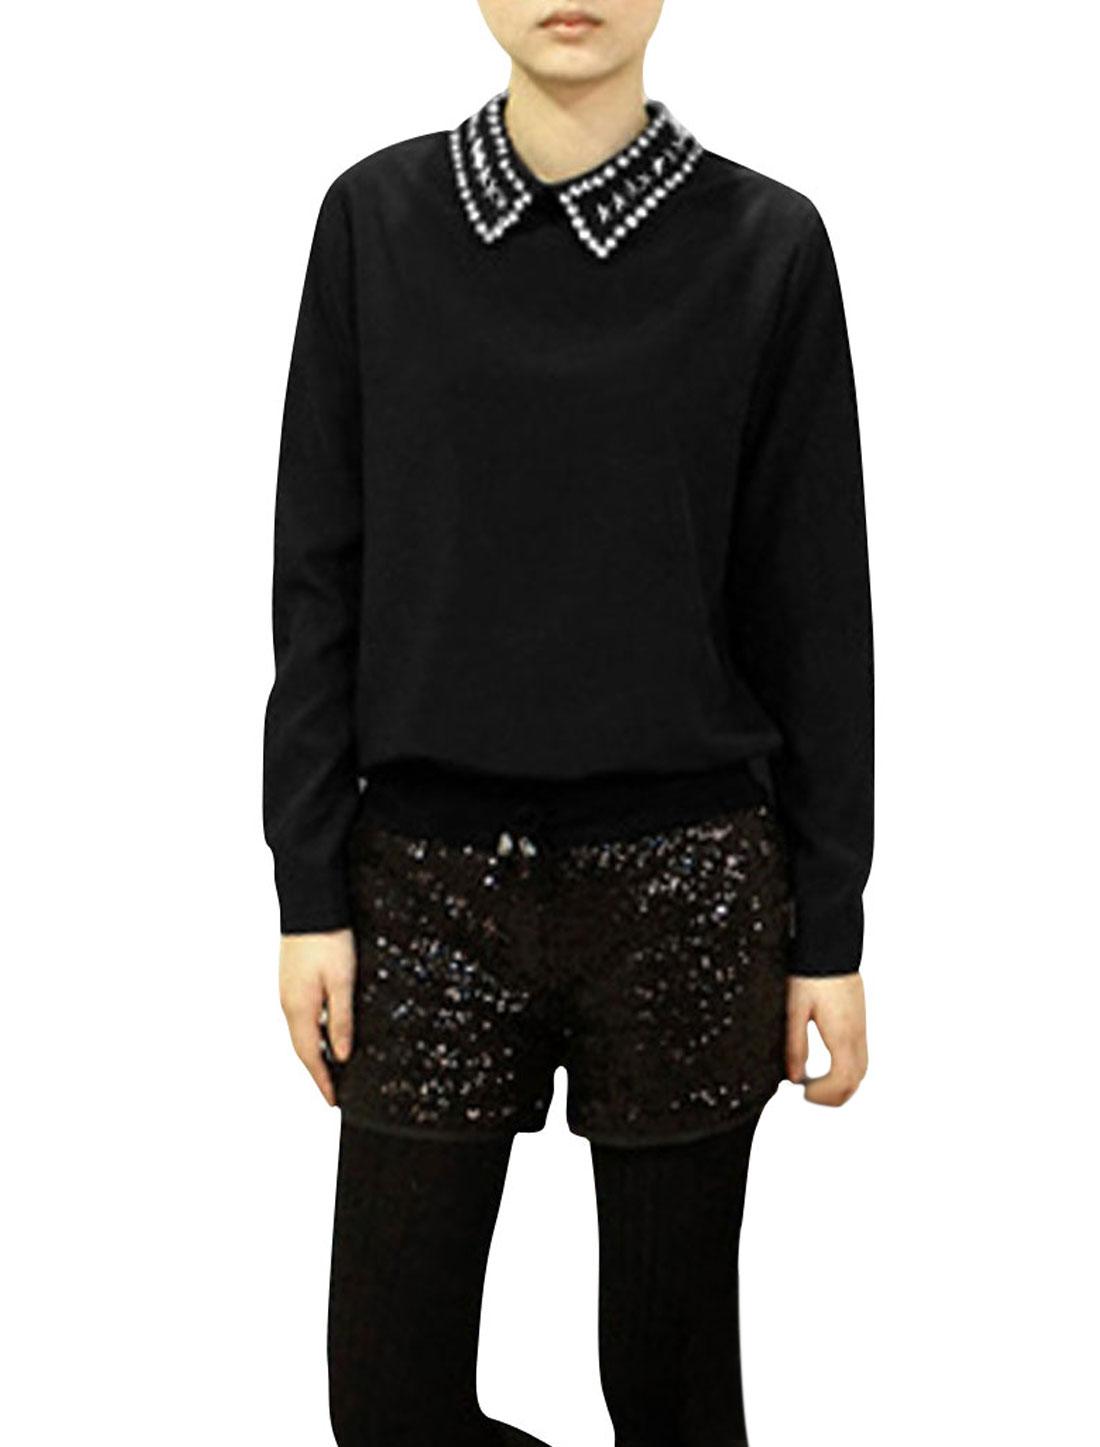 Rhinestone Decor Neckline Single Breasted Back Long Sleeve Woman Shirt Black S